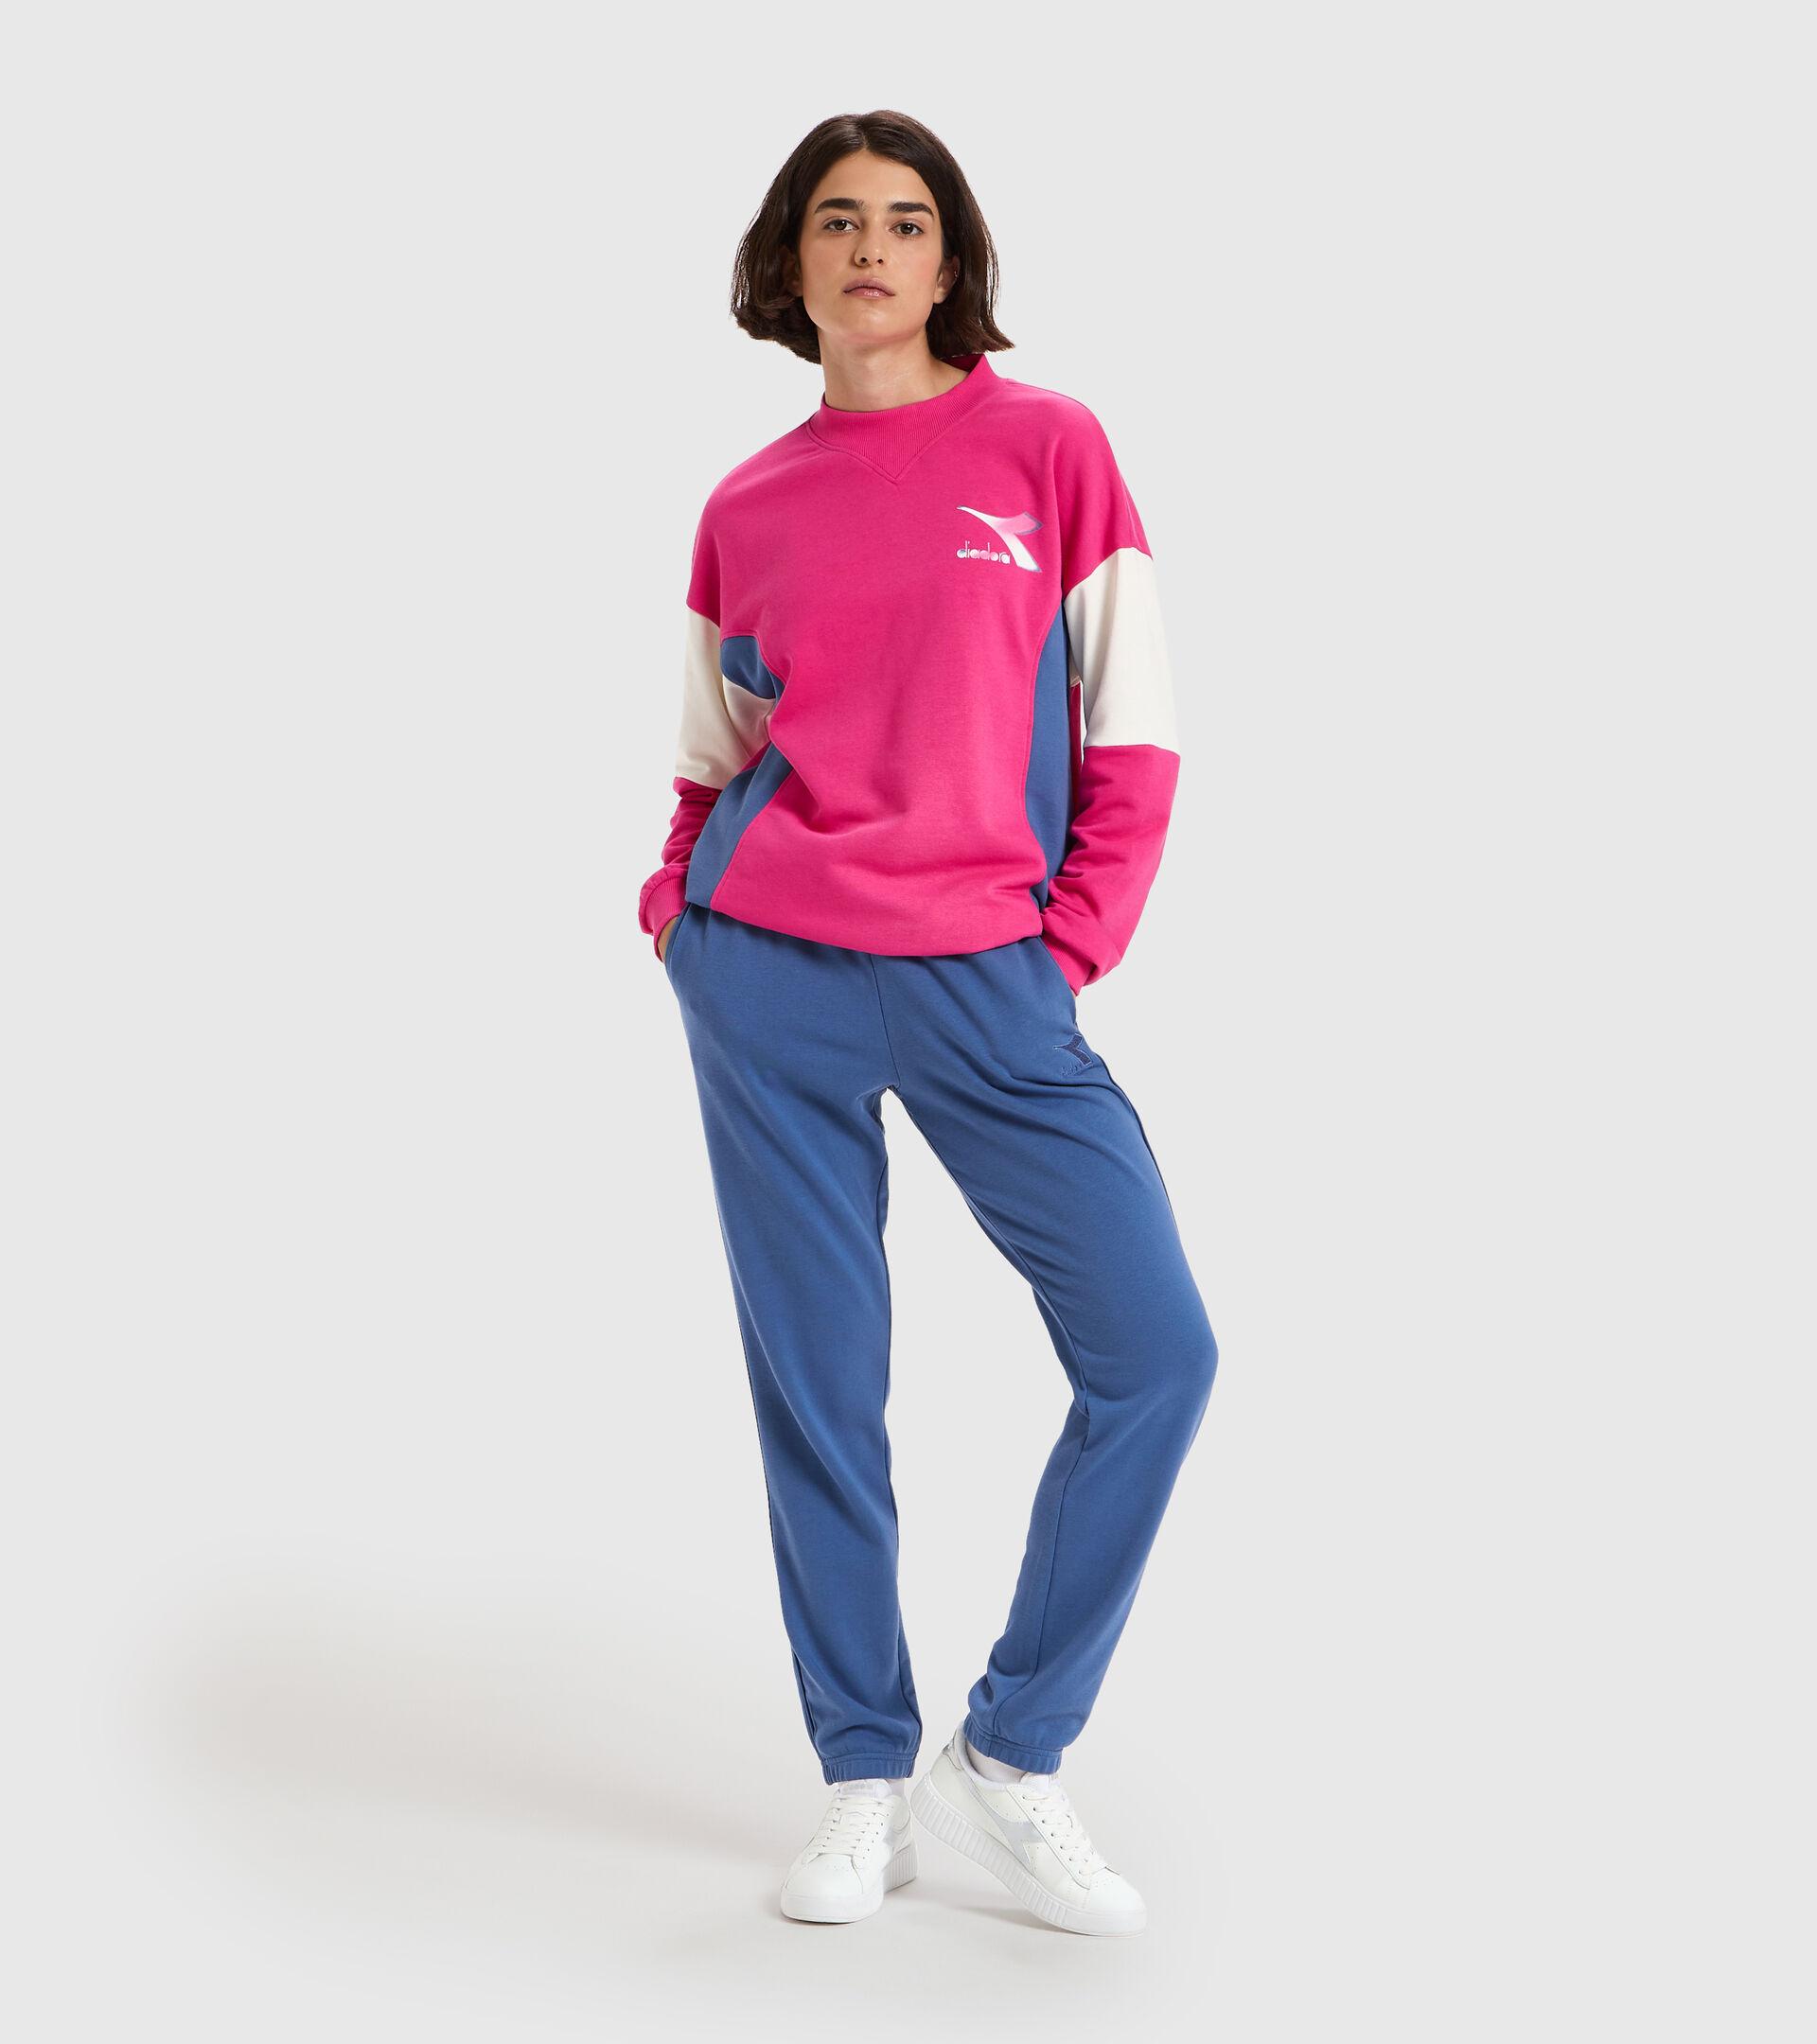 Sporthose - Damen L.PANTS CUFF CORE BIJOU BLAU - Diadora